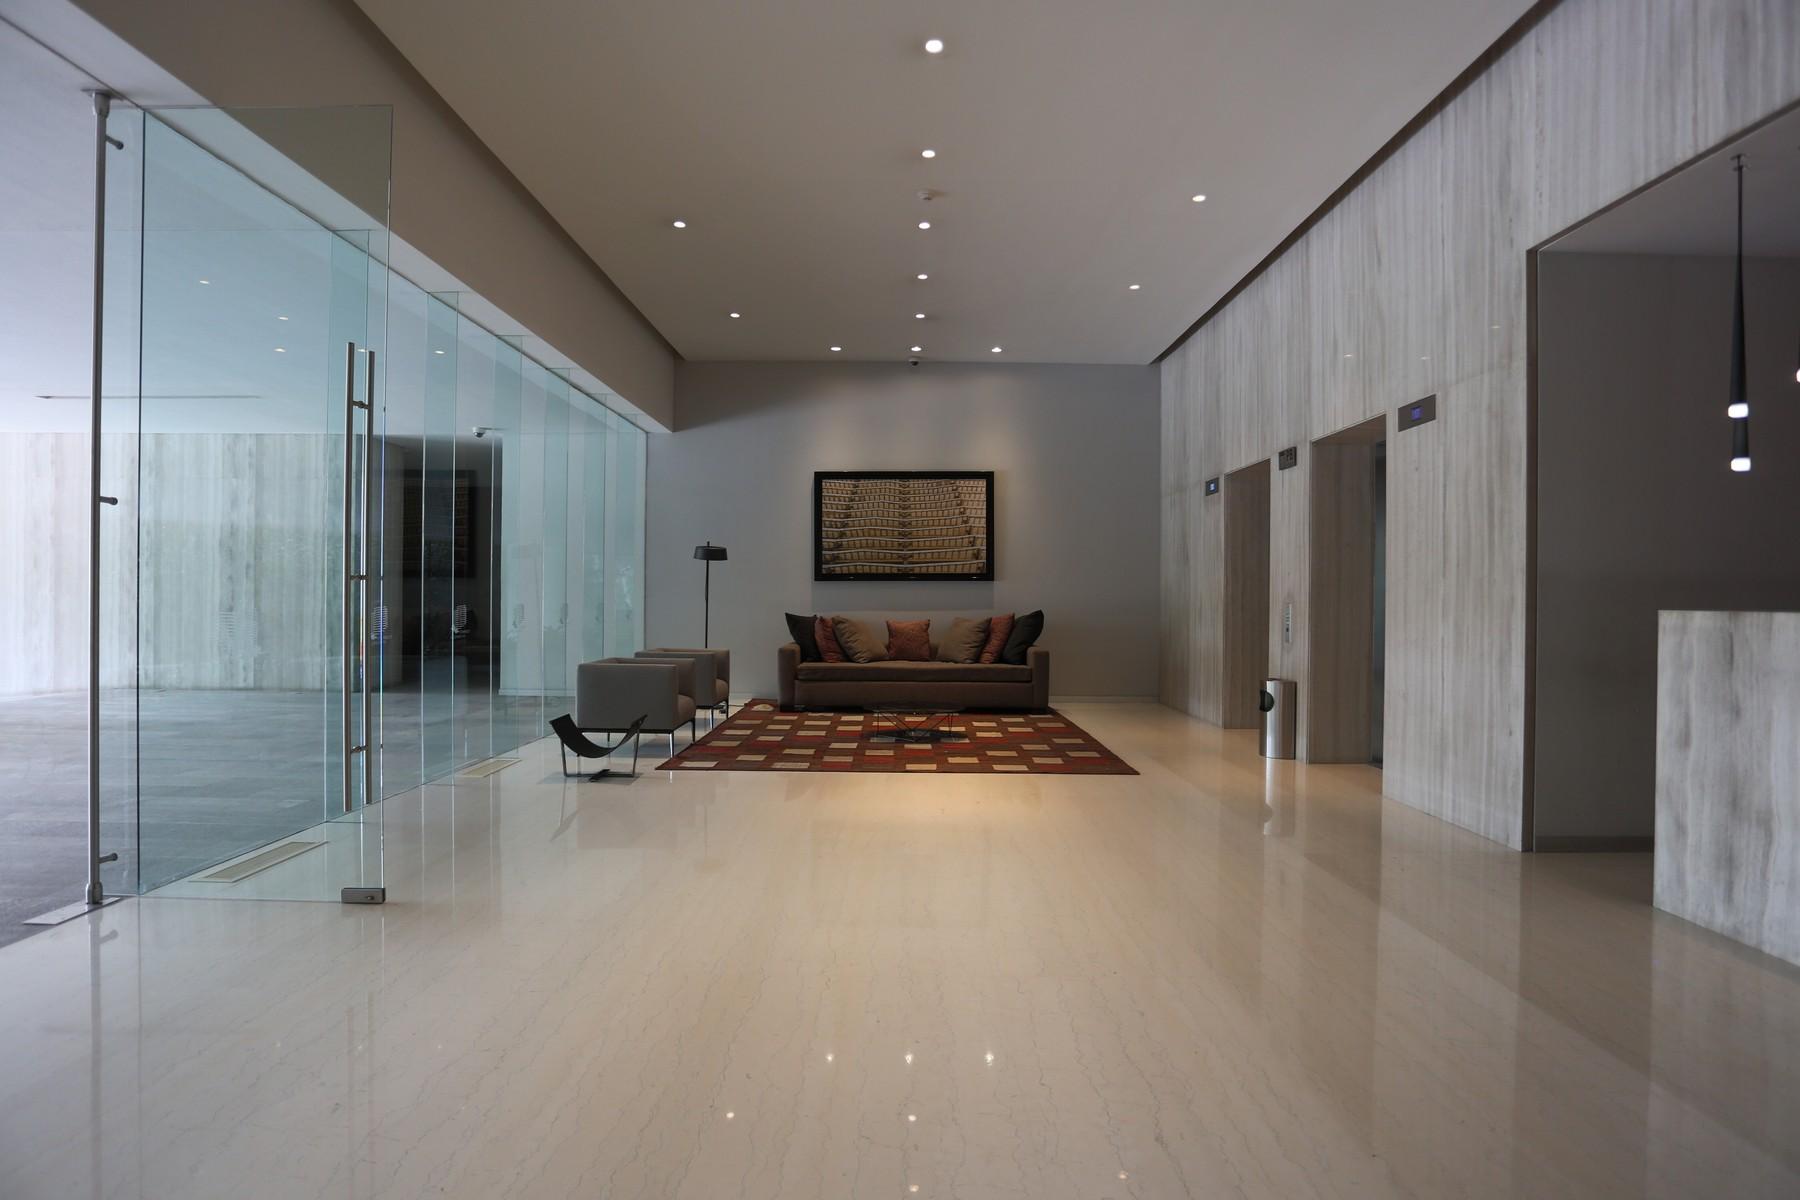 Additional photo for property listing at Torres del Parque, Bosques de Santa Fe  Federal District, Mexico Df 05600 México